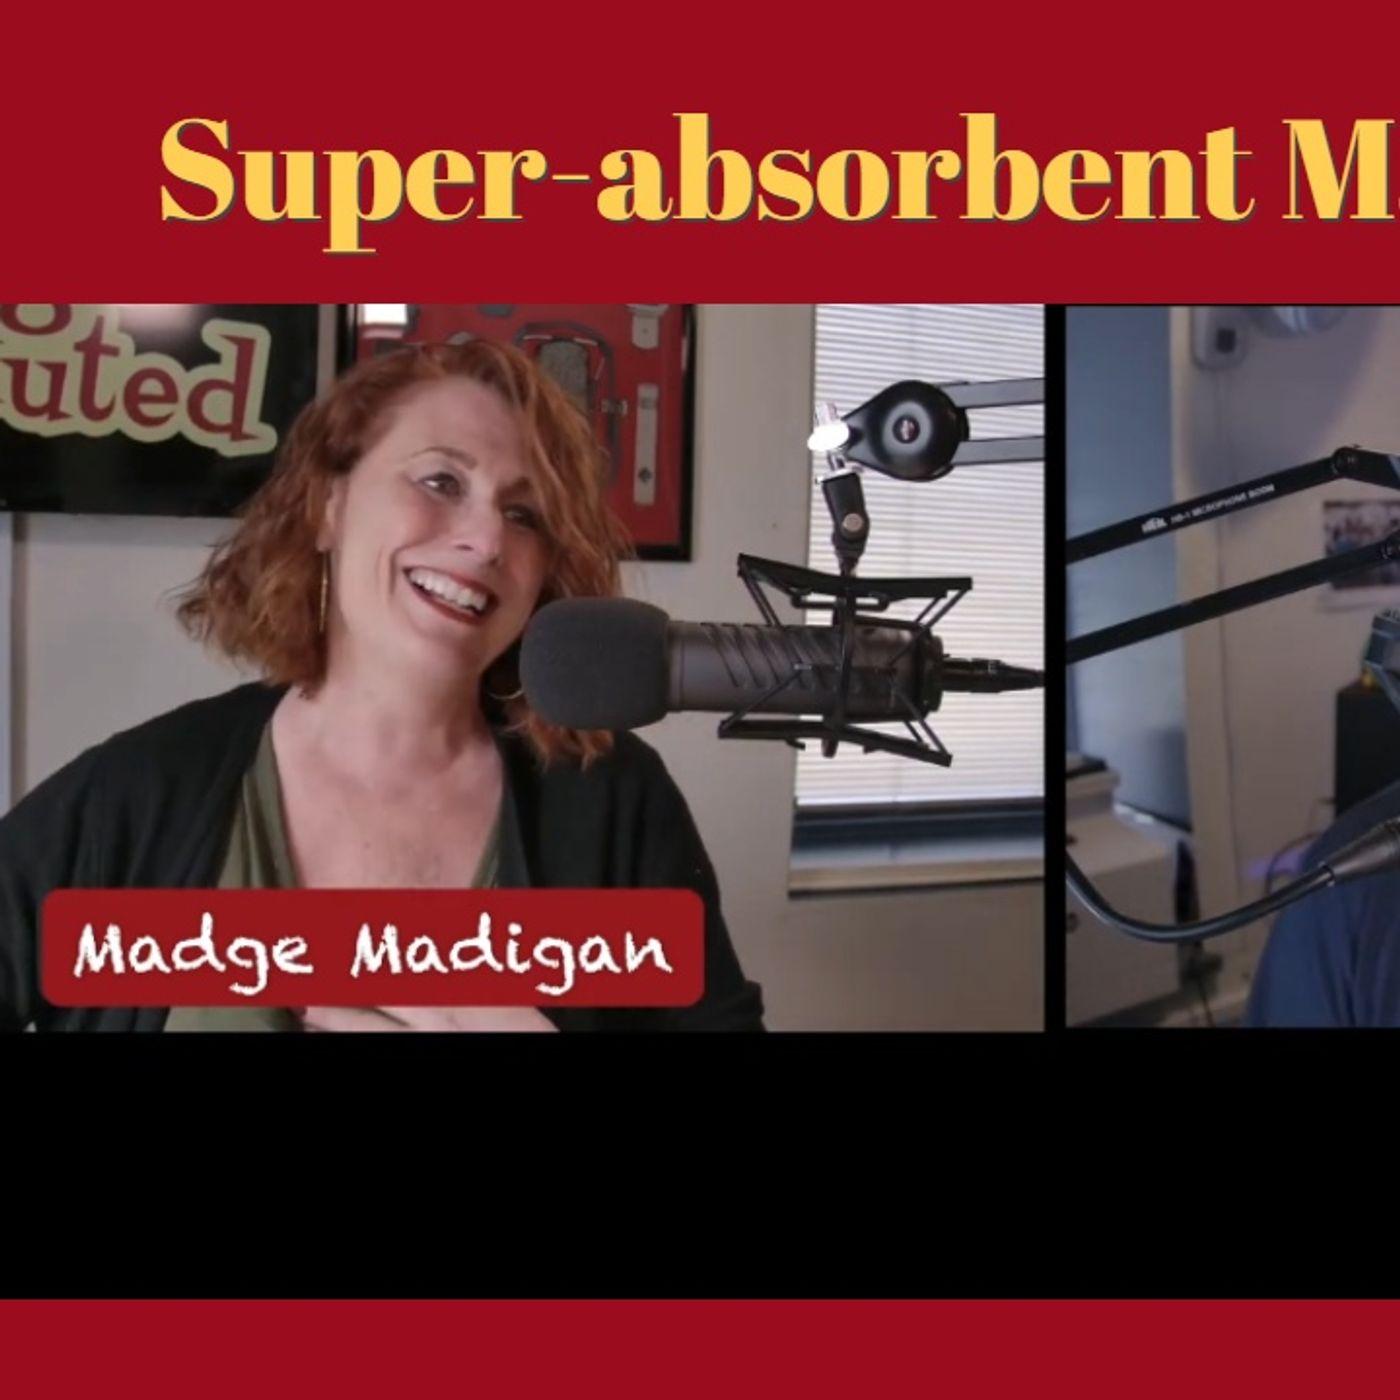 Super-absorbent Madge!